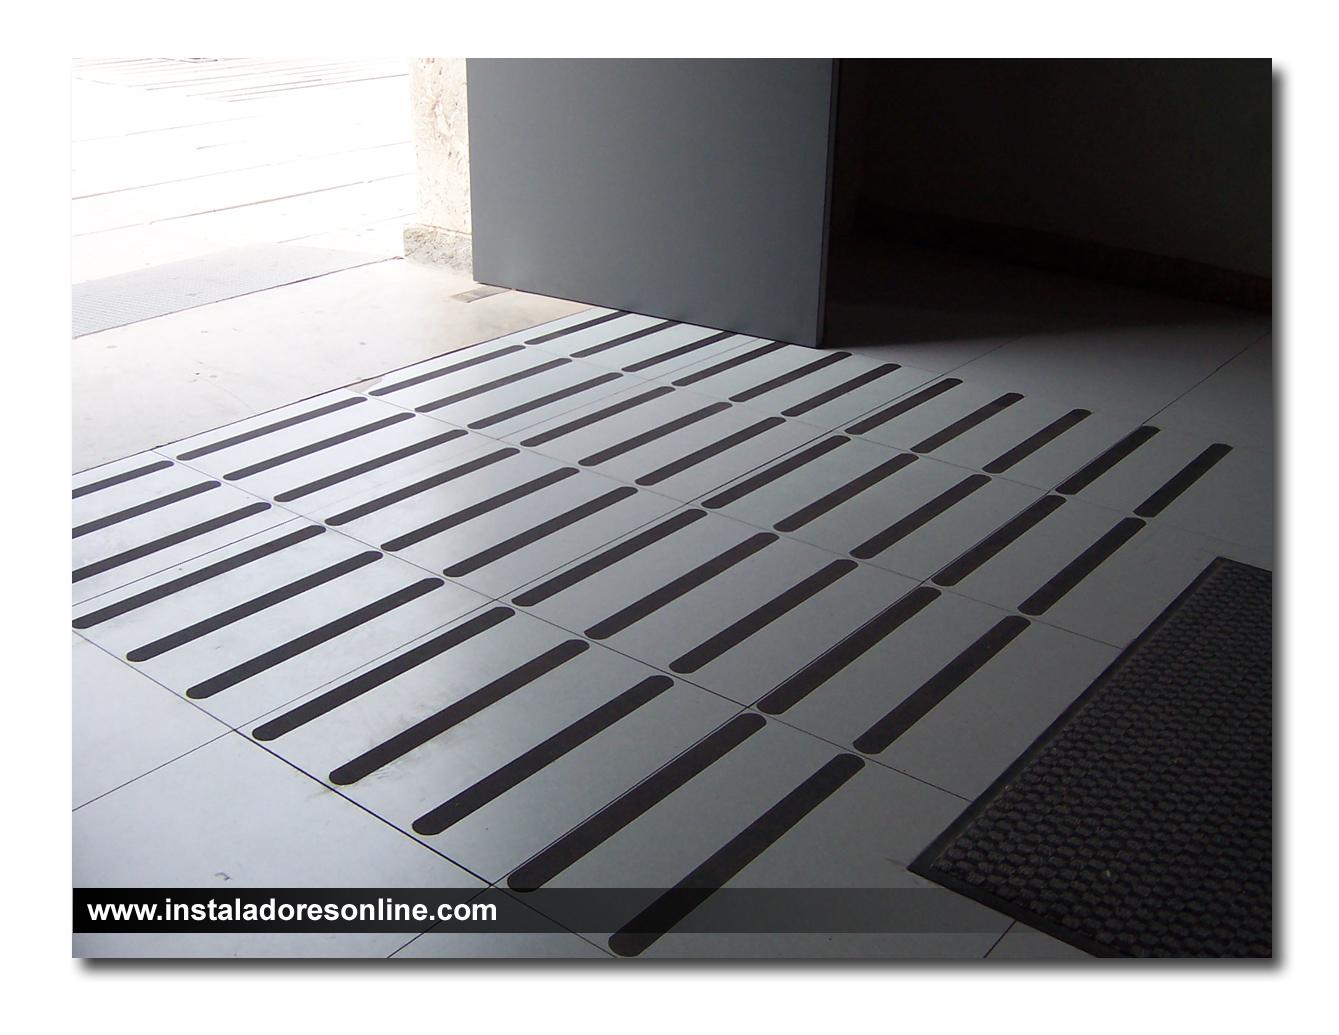 Tiras antideslizantes para rampas transportes de paneles - Suelos antideslizantes para duchas ...